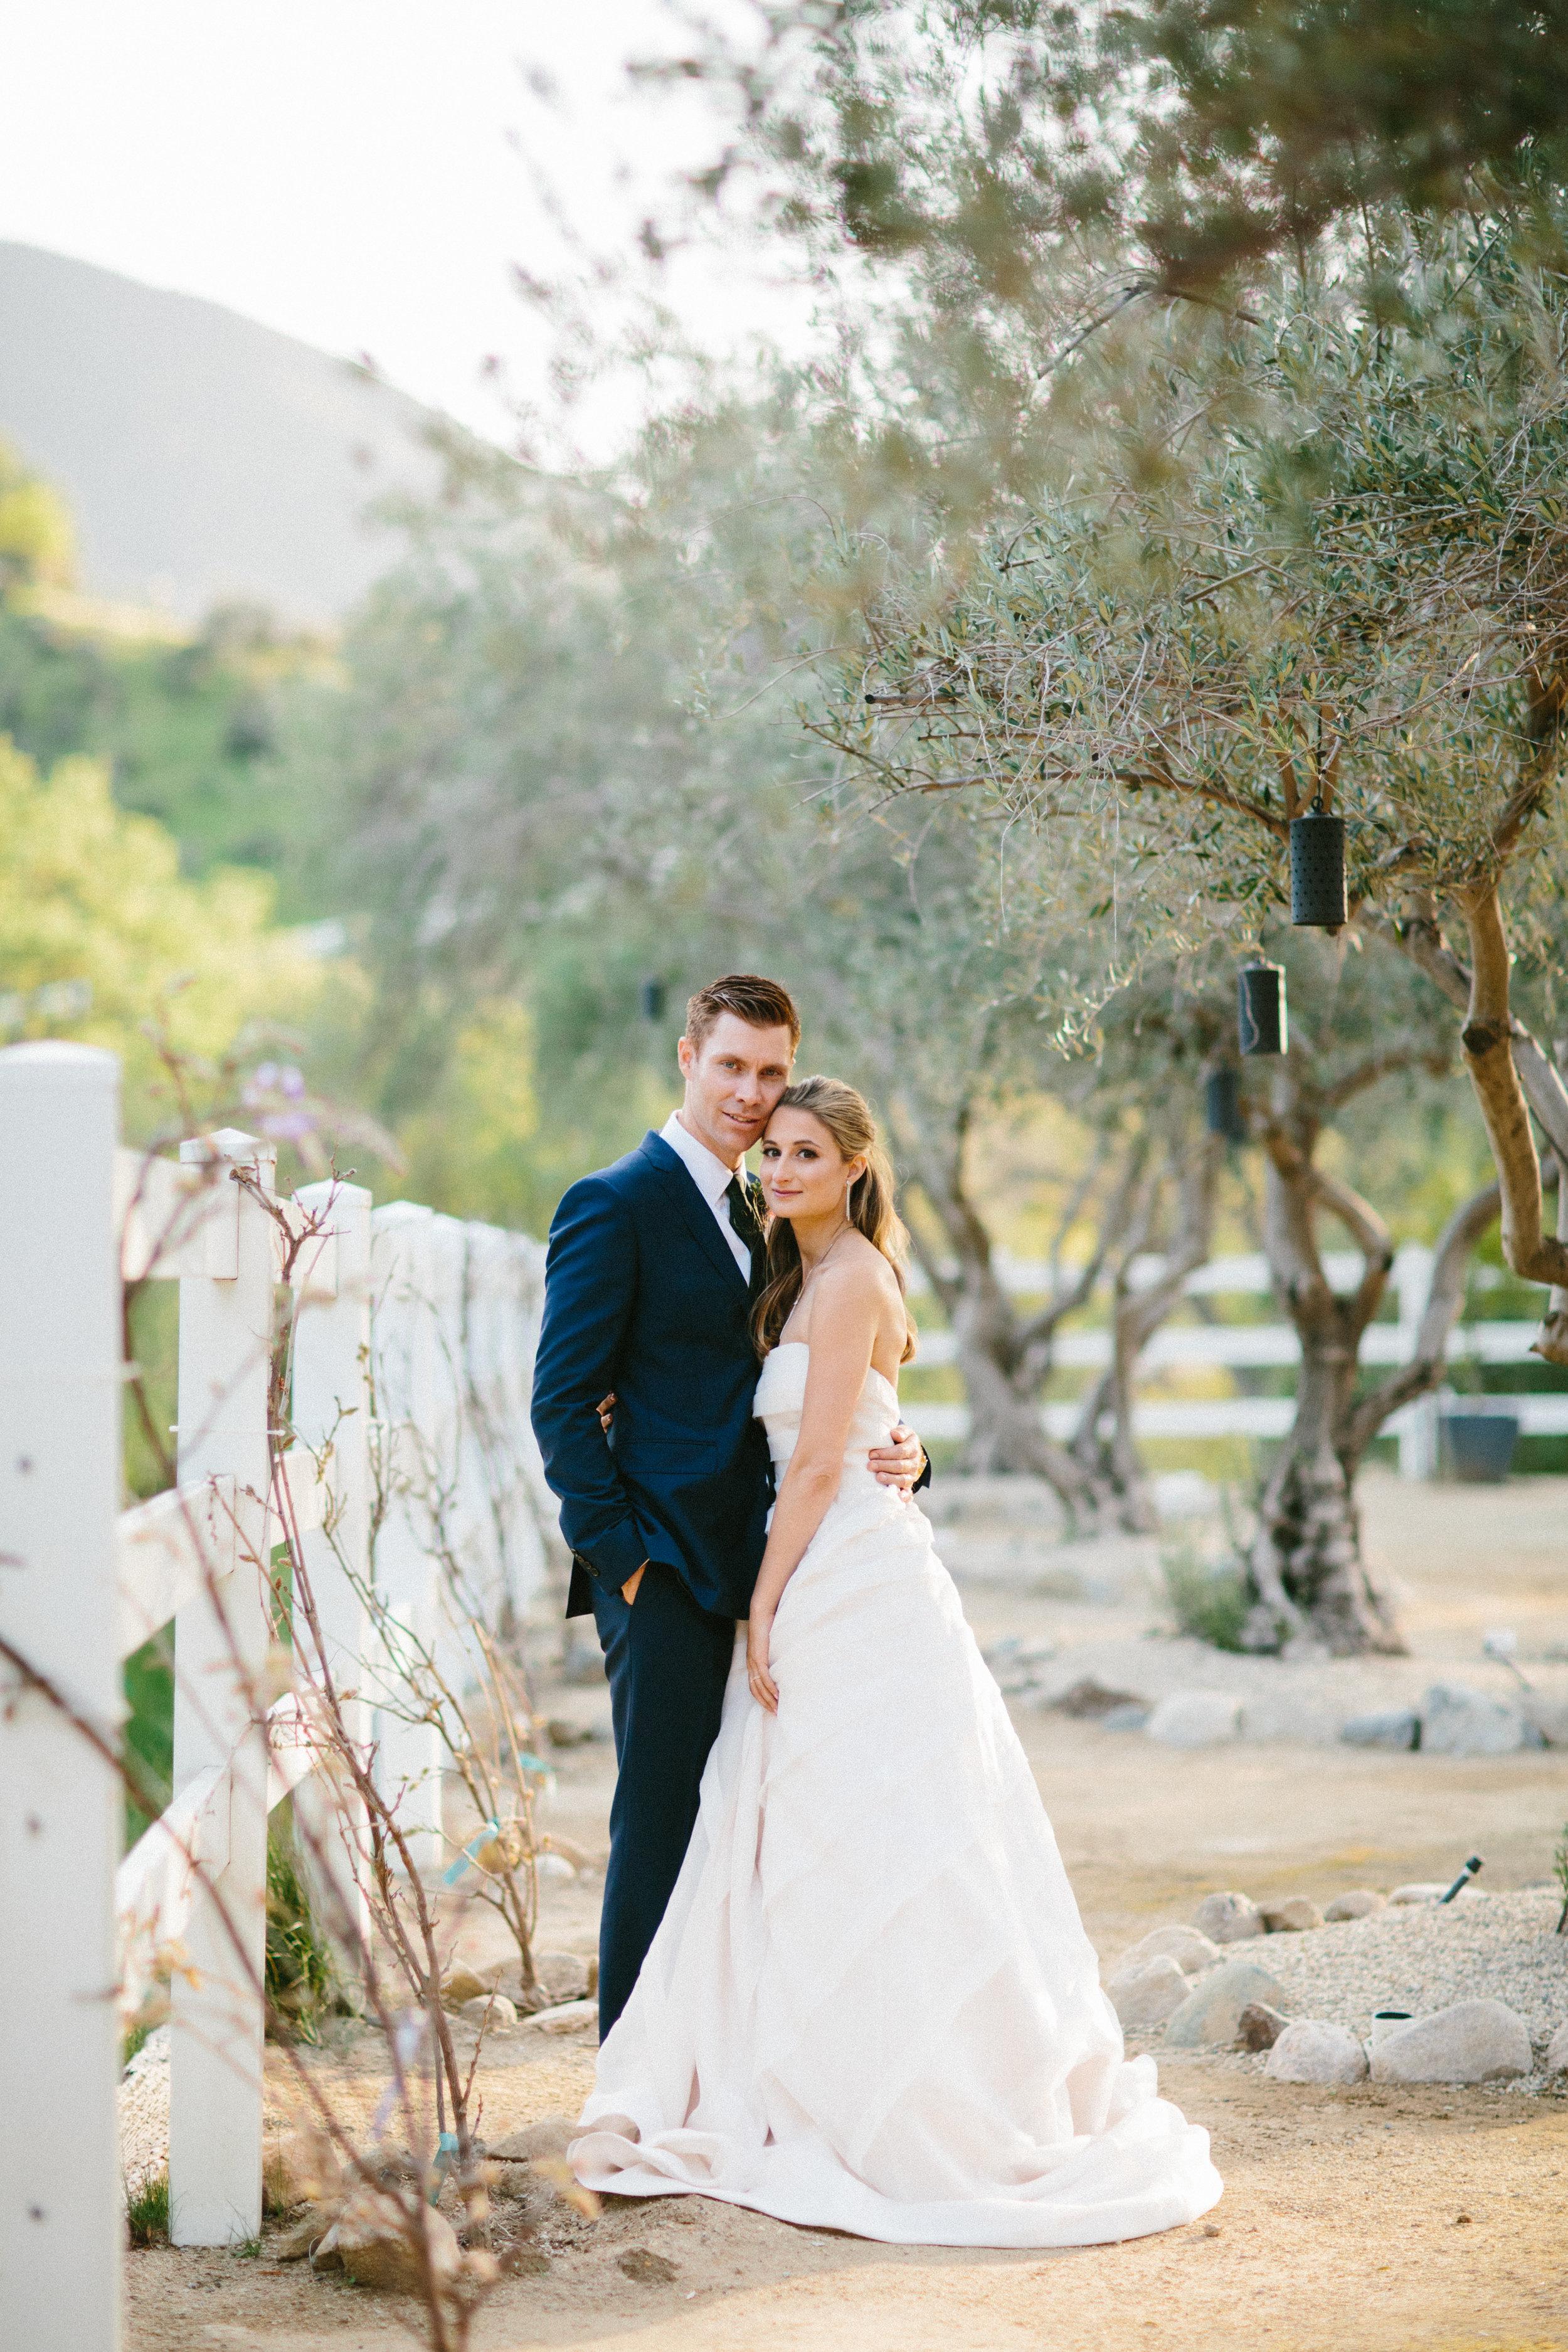 los angeles wedding photographer, los angeles, wedding photography, california, wedding, photography, southern california, photographer, california wedding photography